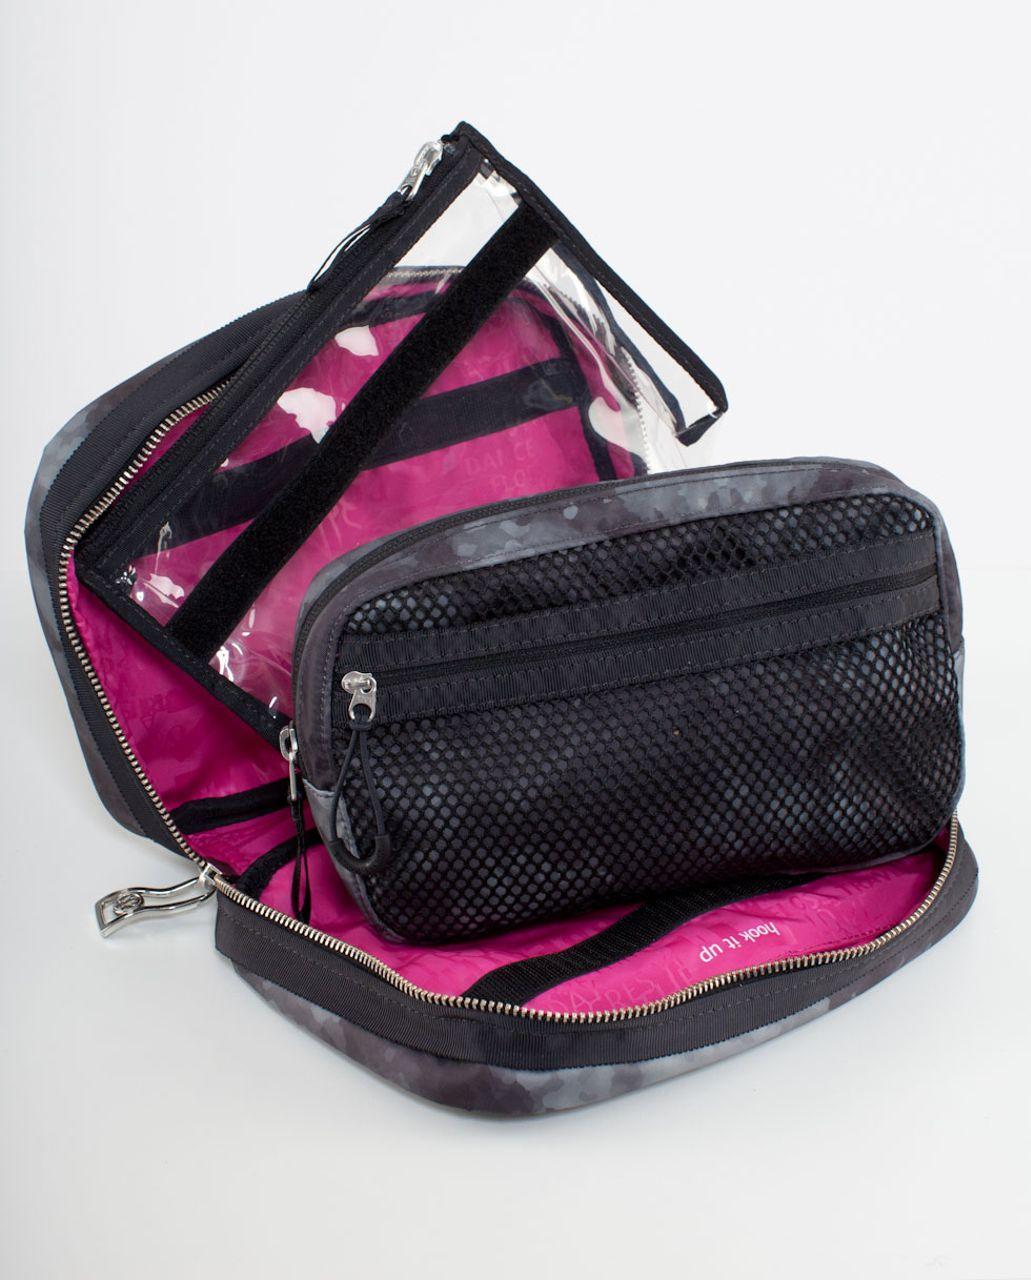 Lululemon Gym Essentials Kit - Deep Coal Creekside Camo